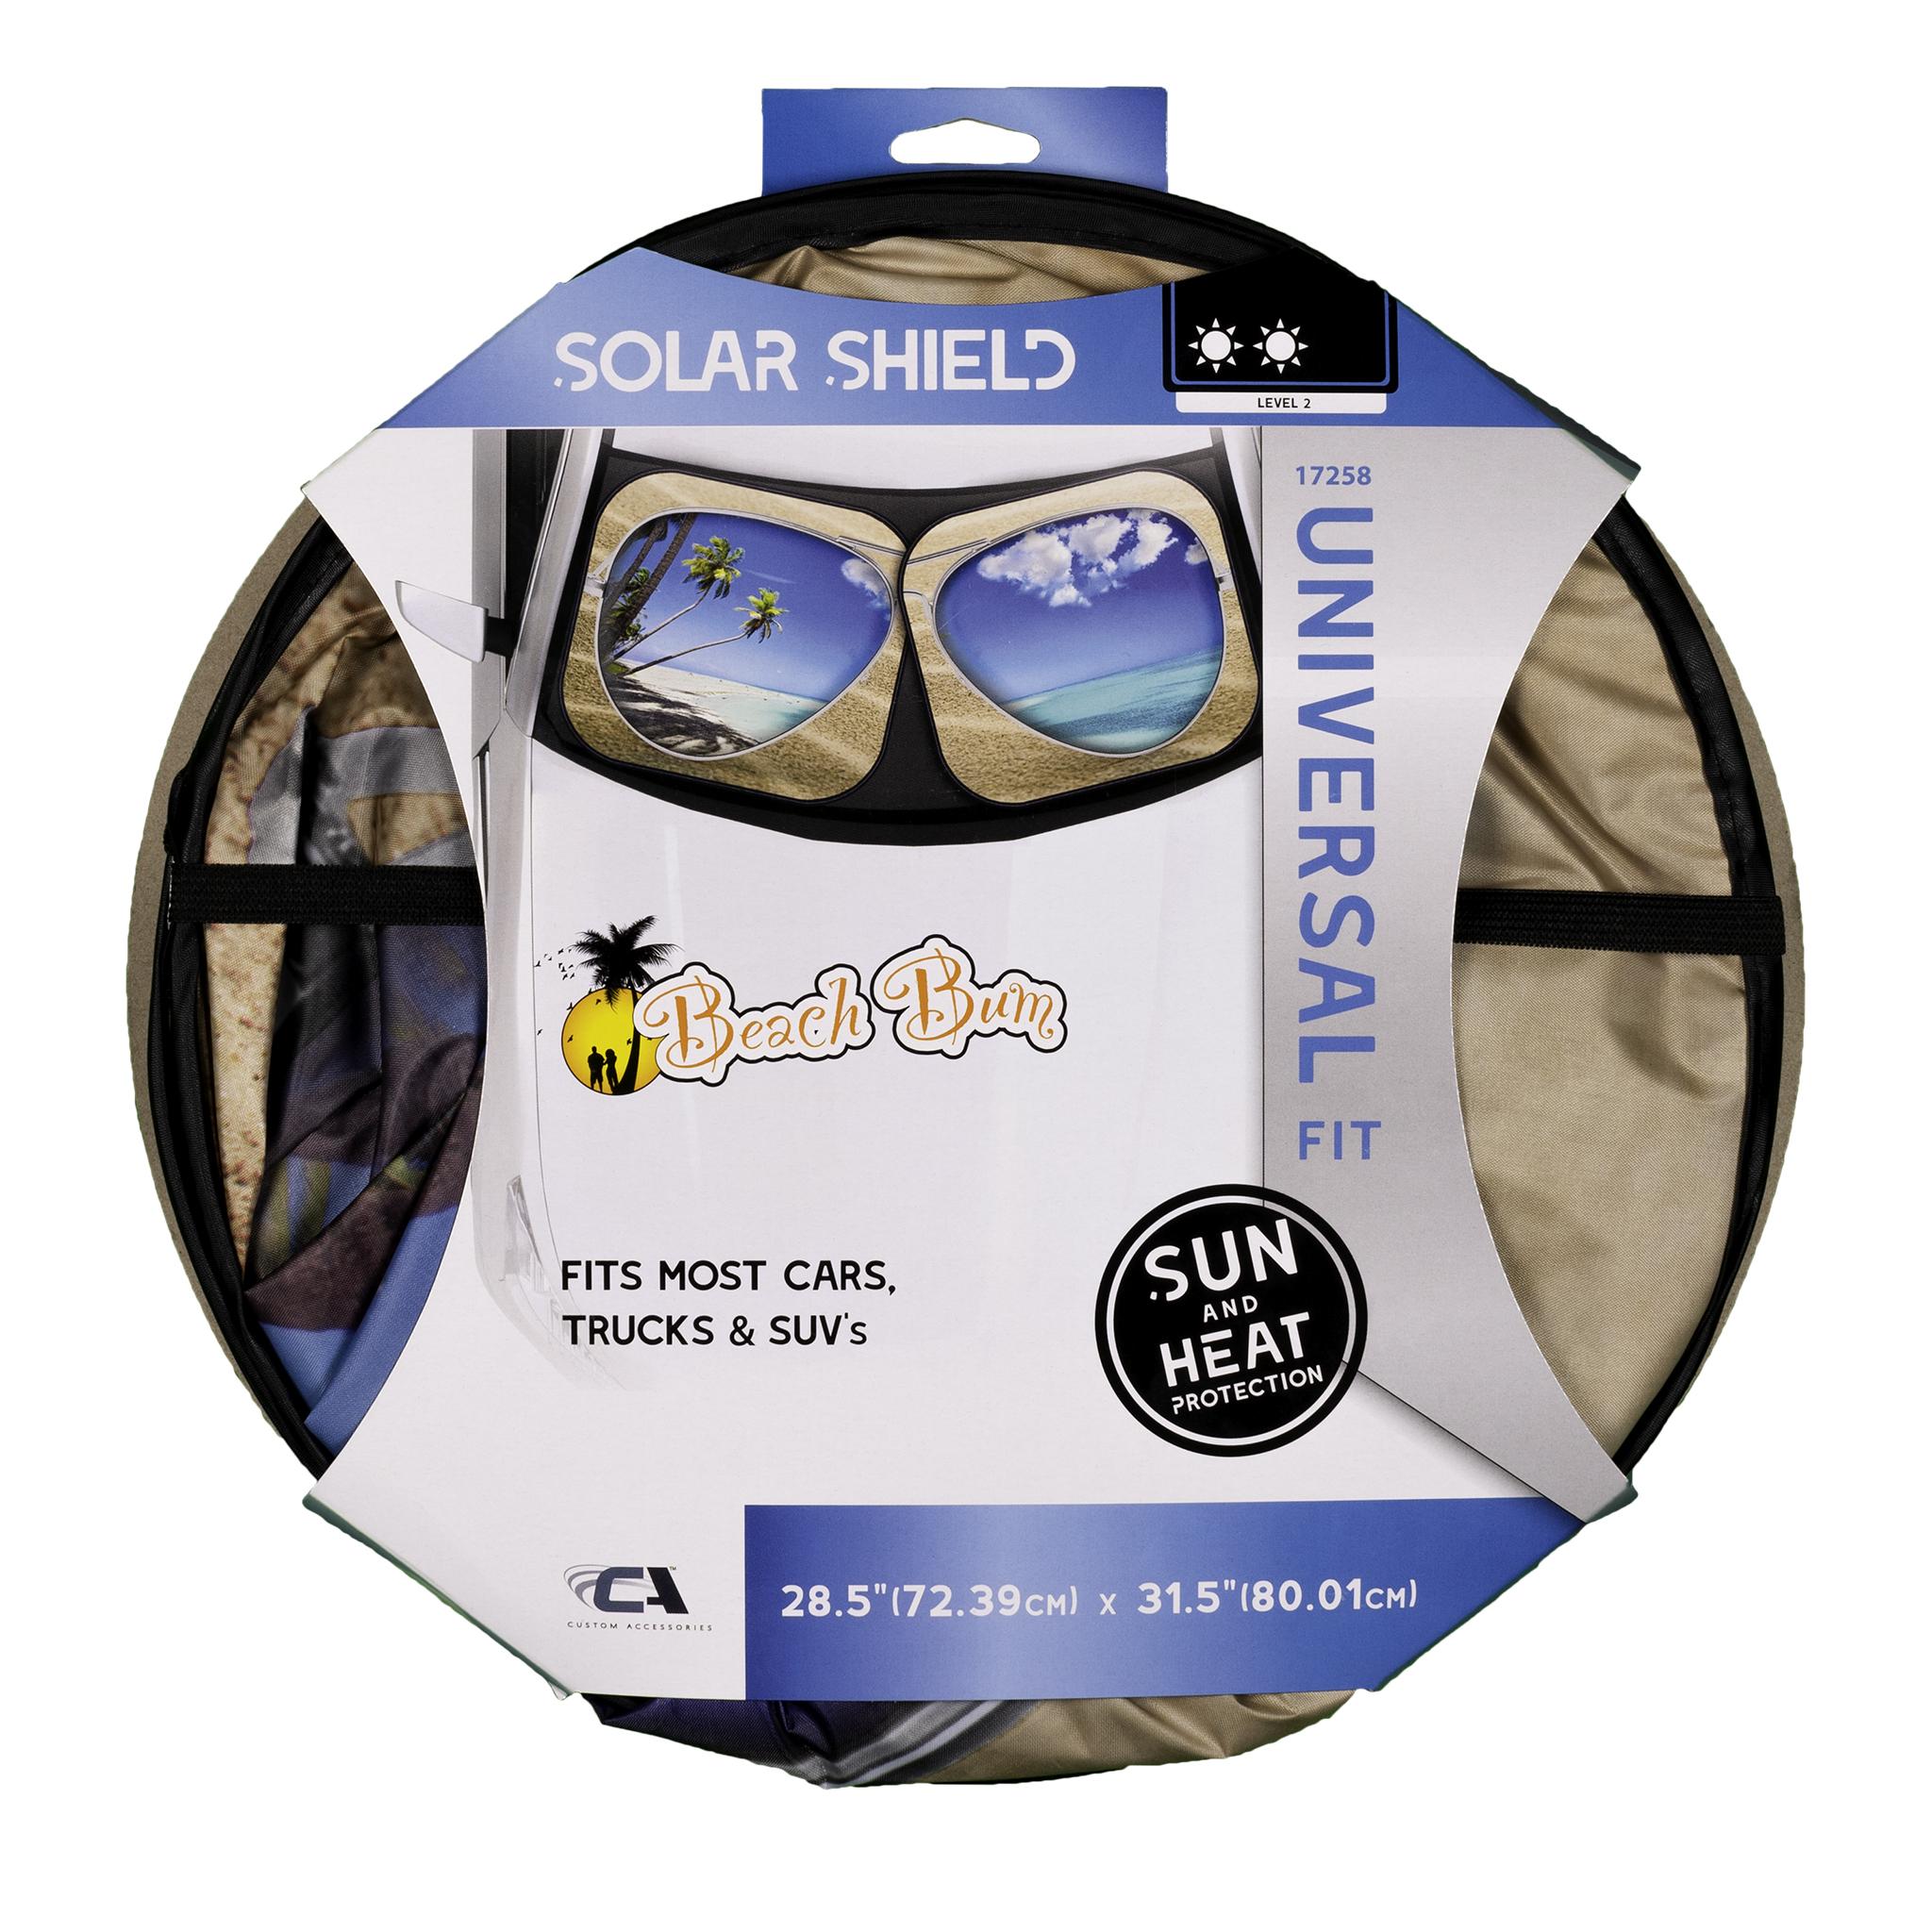 Beach Bum Solar Shield - Packaging Front Cropped (white).jpg